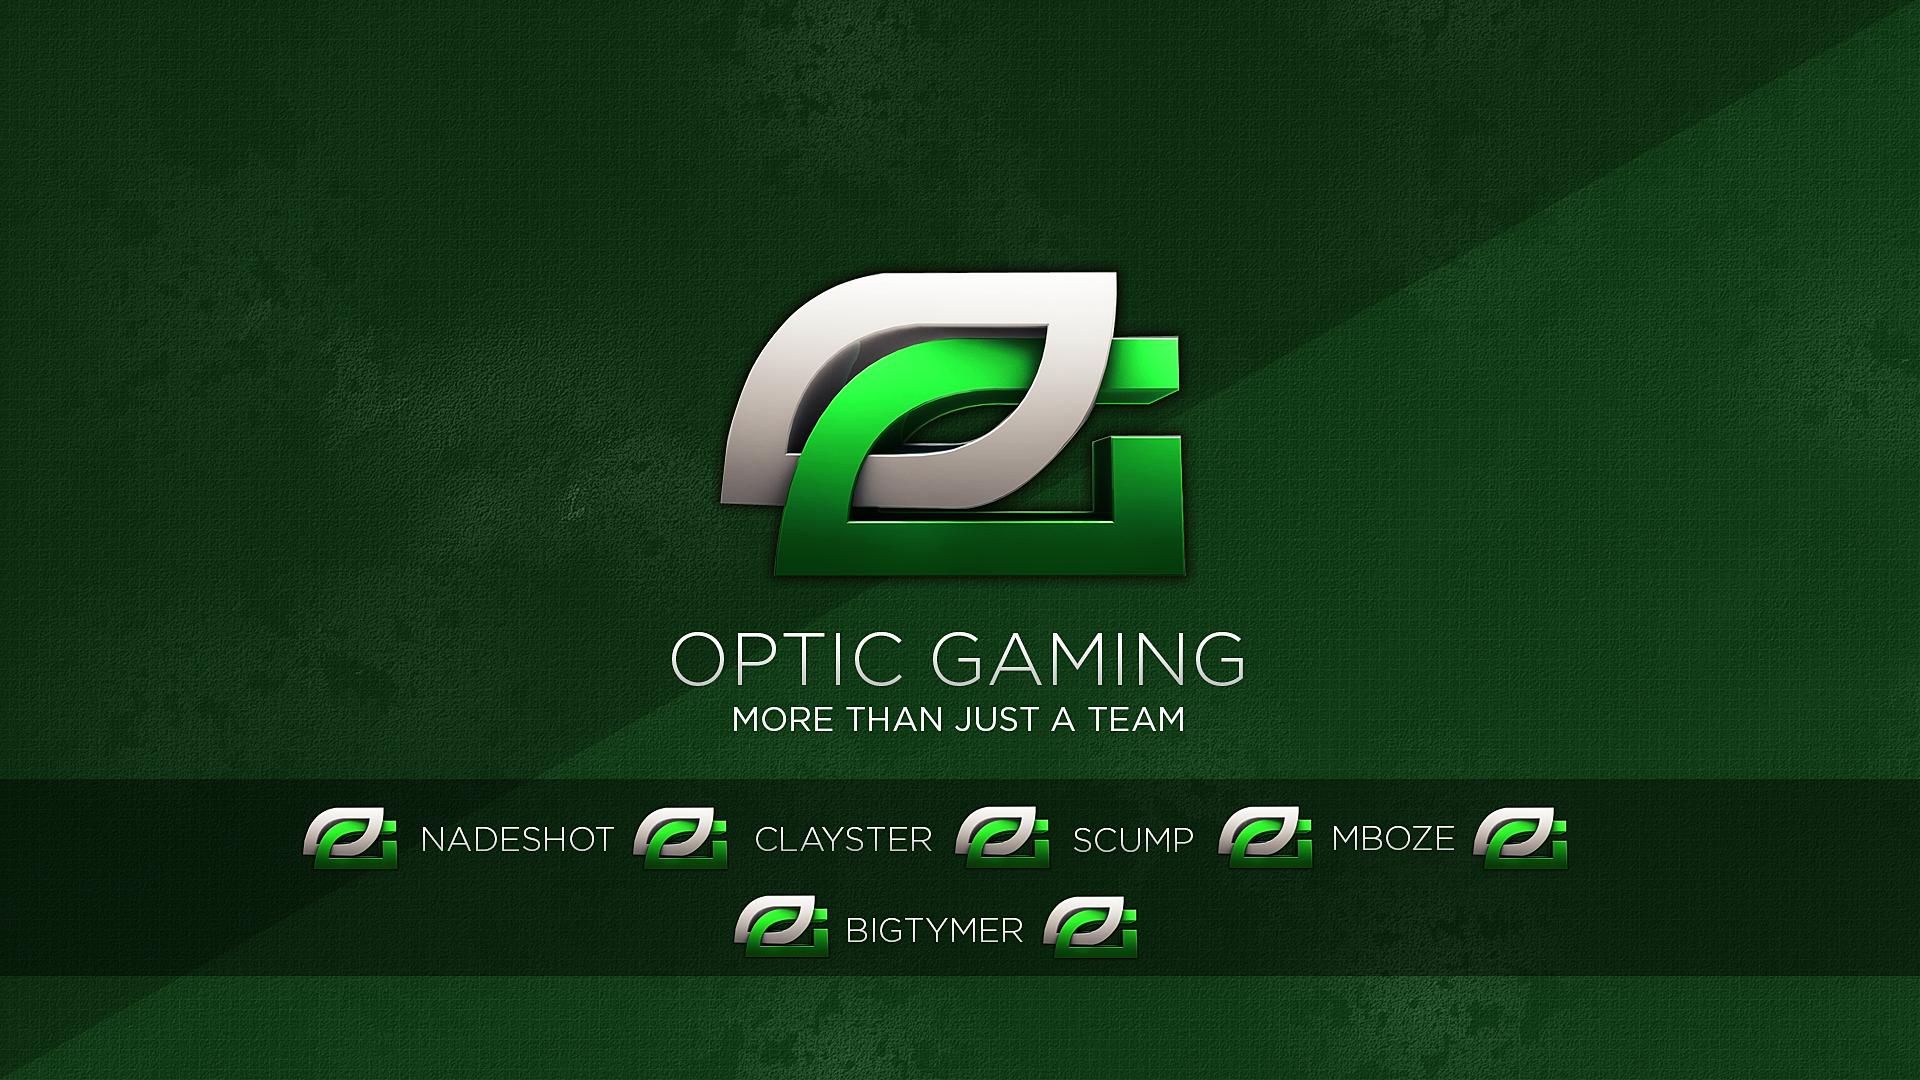 optic gaming 2015 images